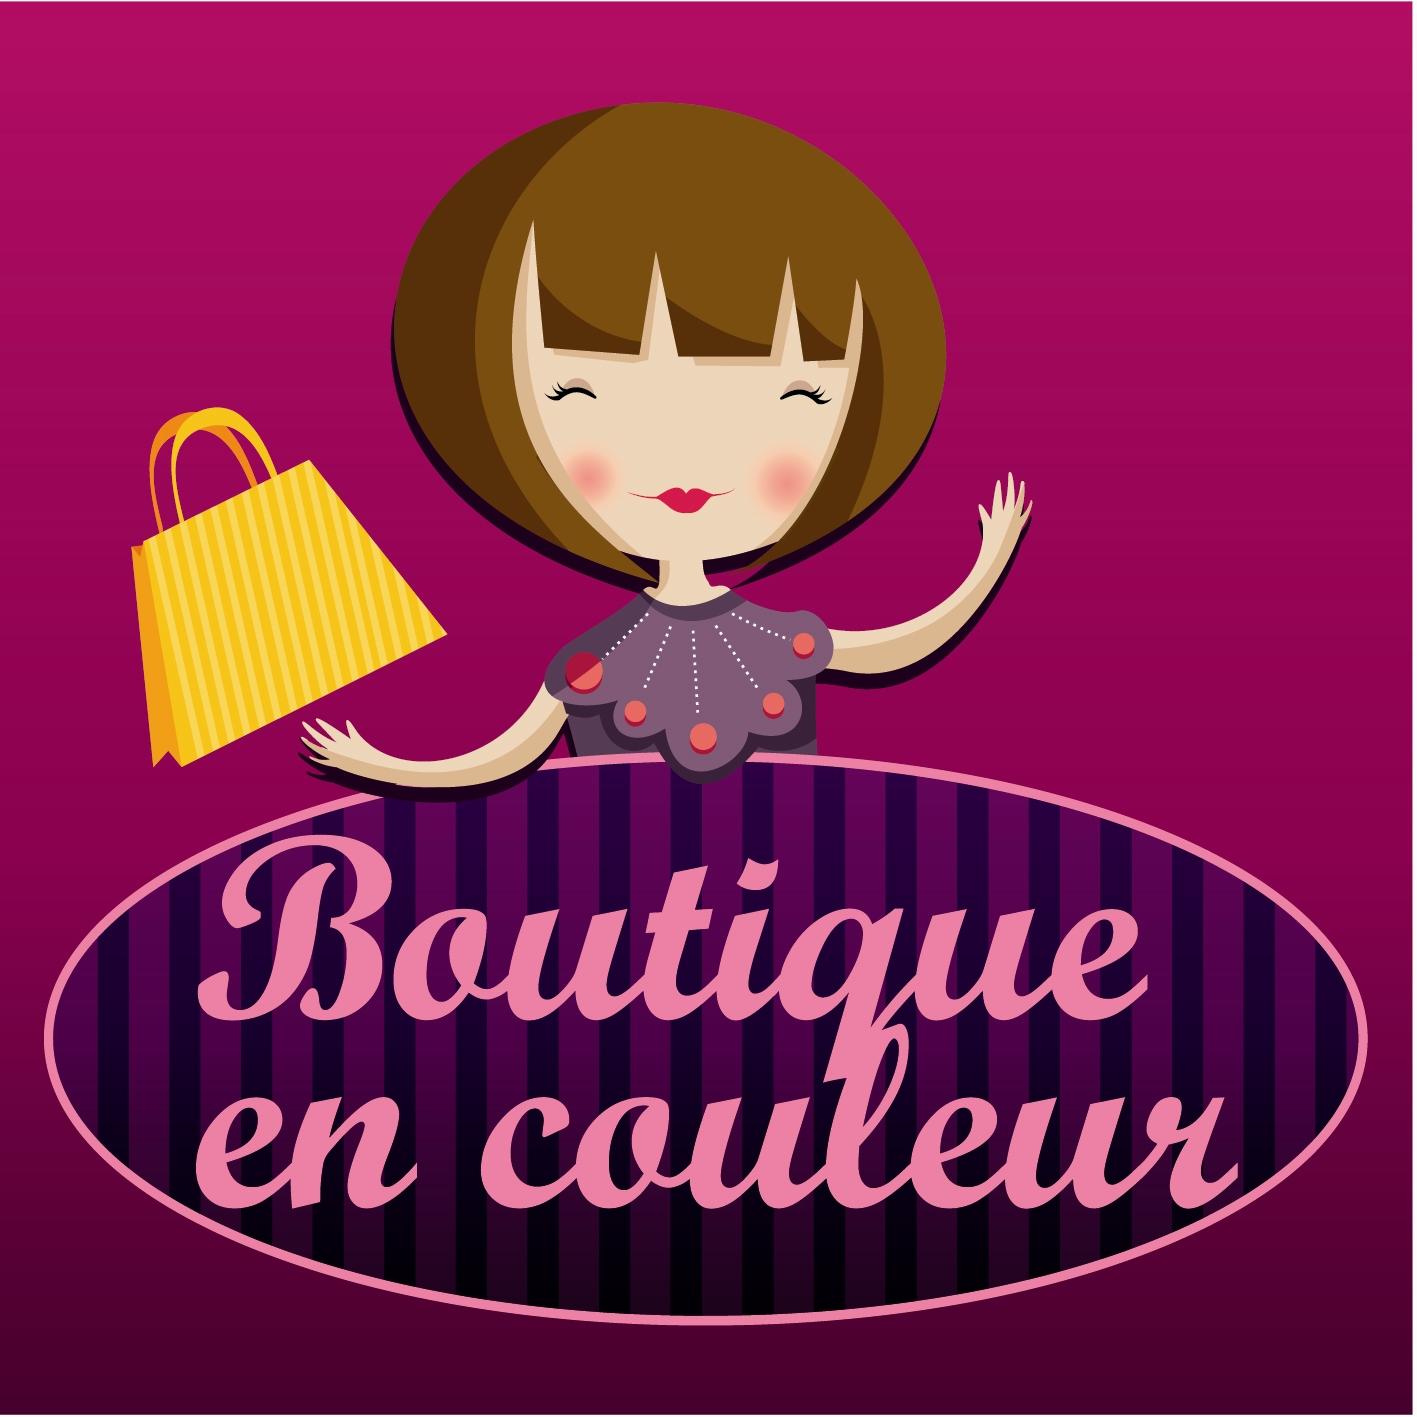 Boutique en couleur boutiqueencouleurlogo-exe-01.JPG